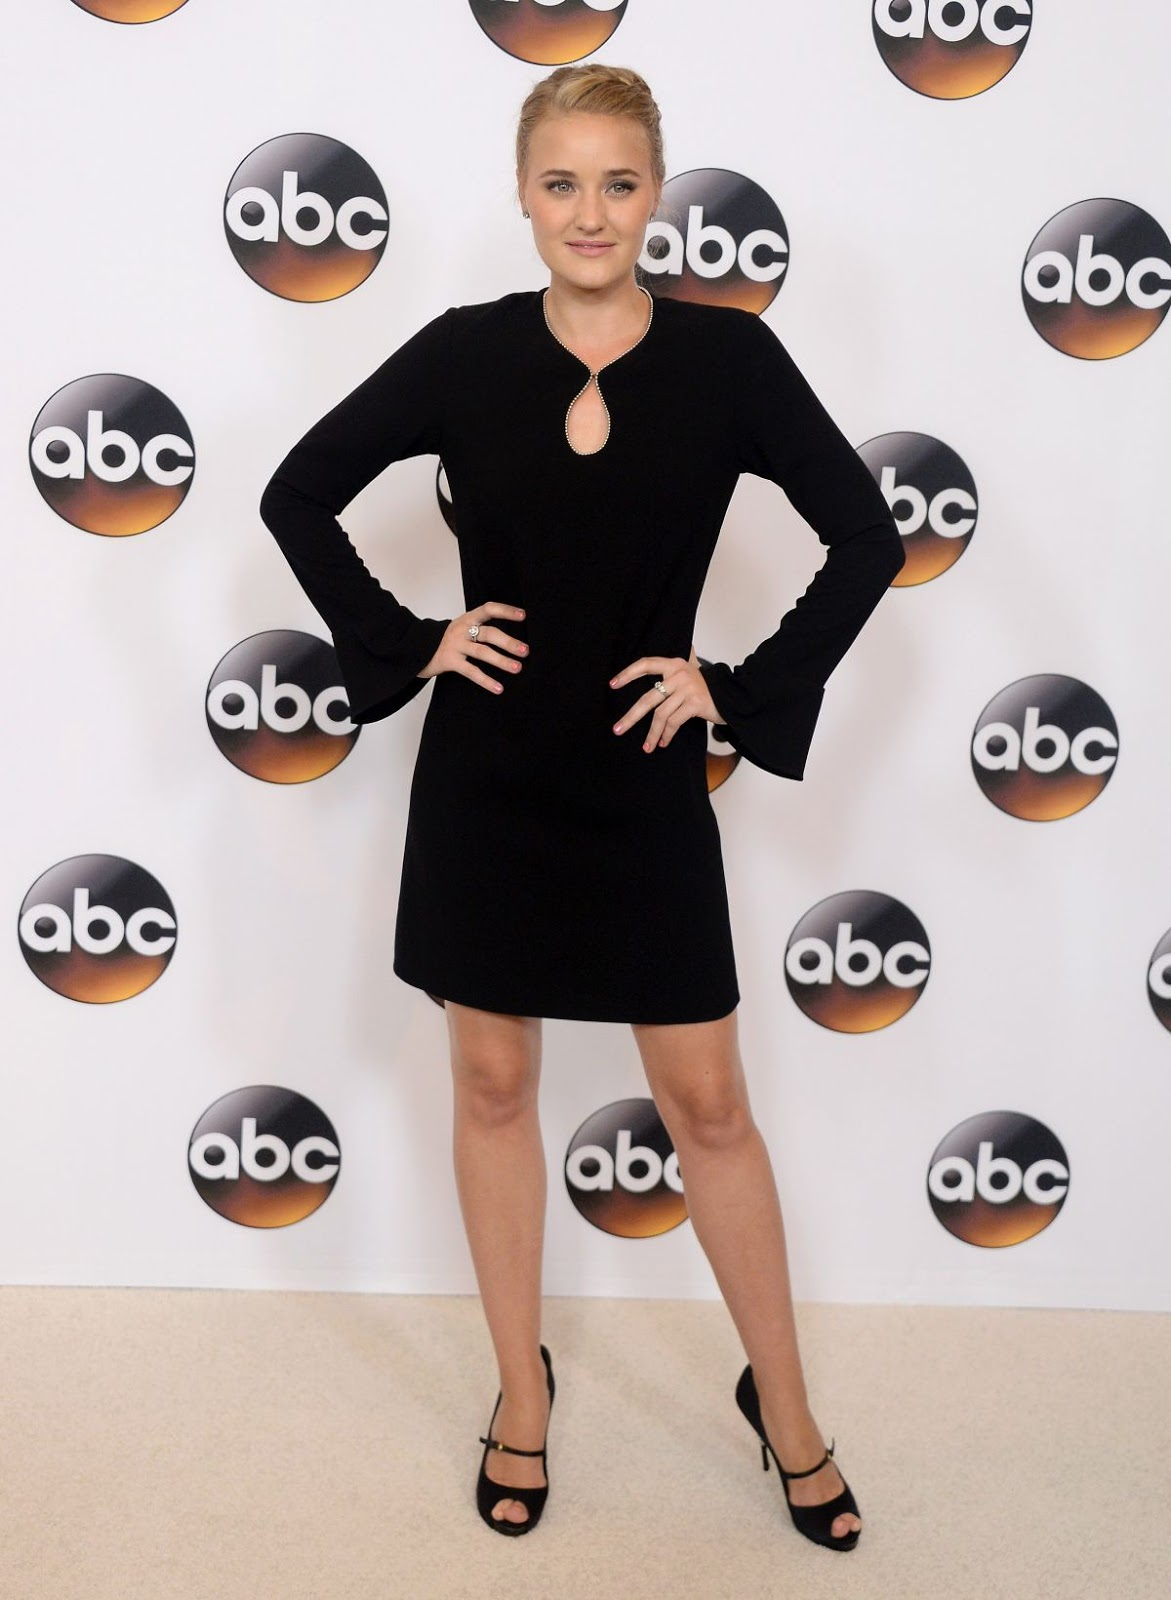 Amanda Aj Michalka at Disney ABC Television TCA Summer Press Tour in Beverly Hills